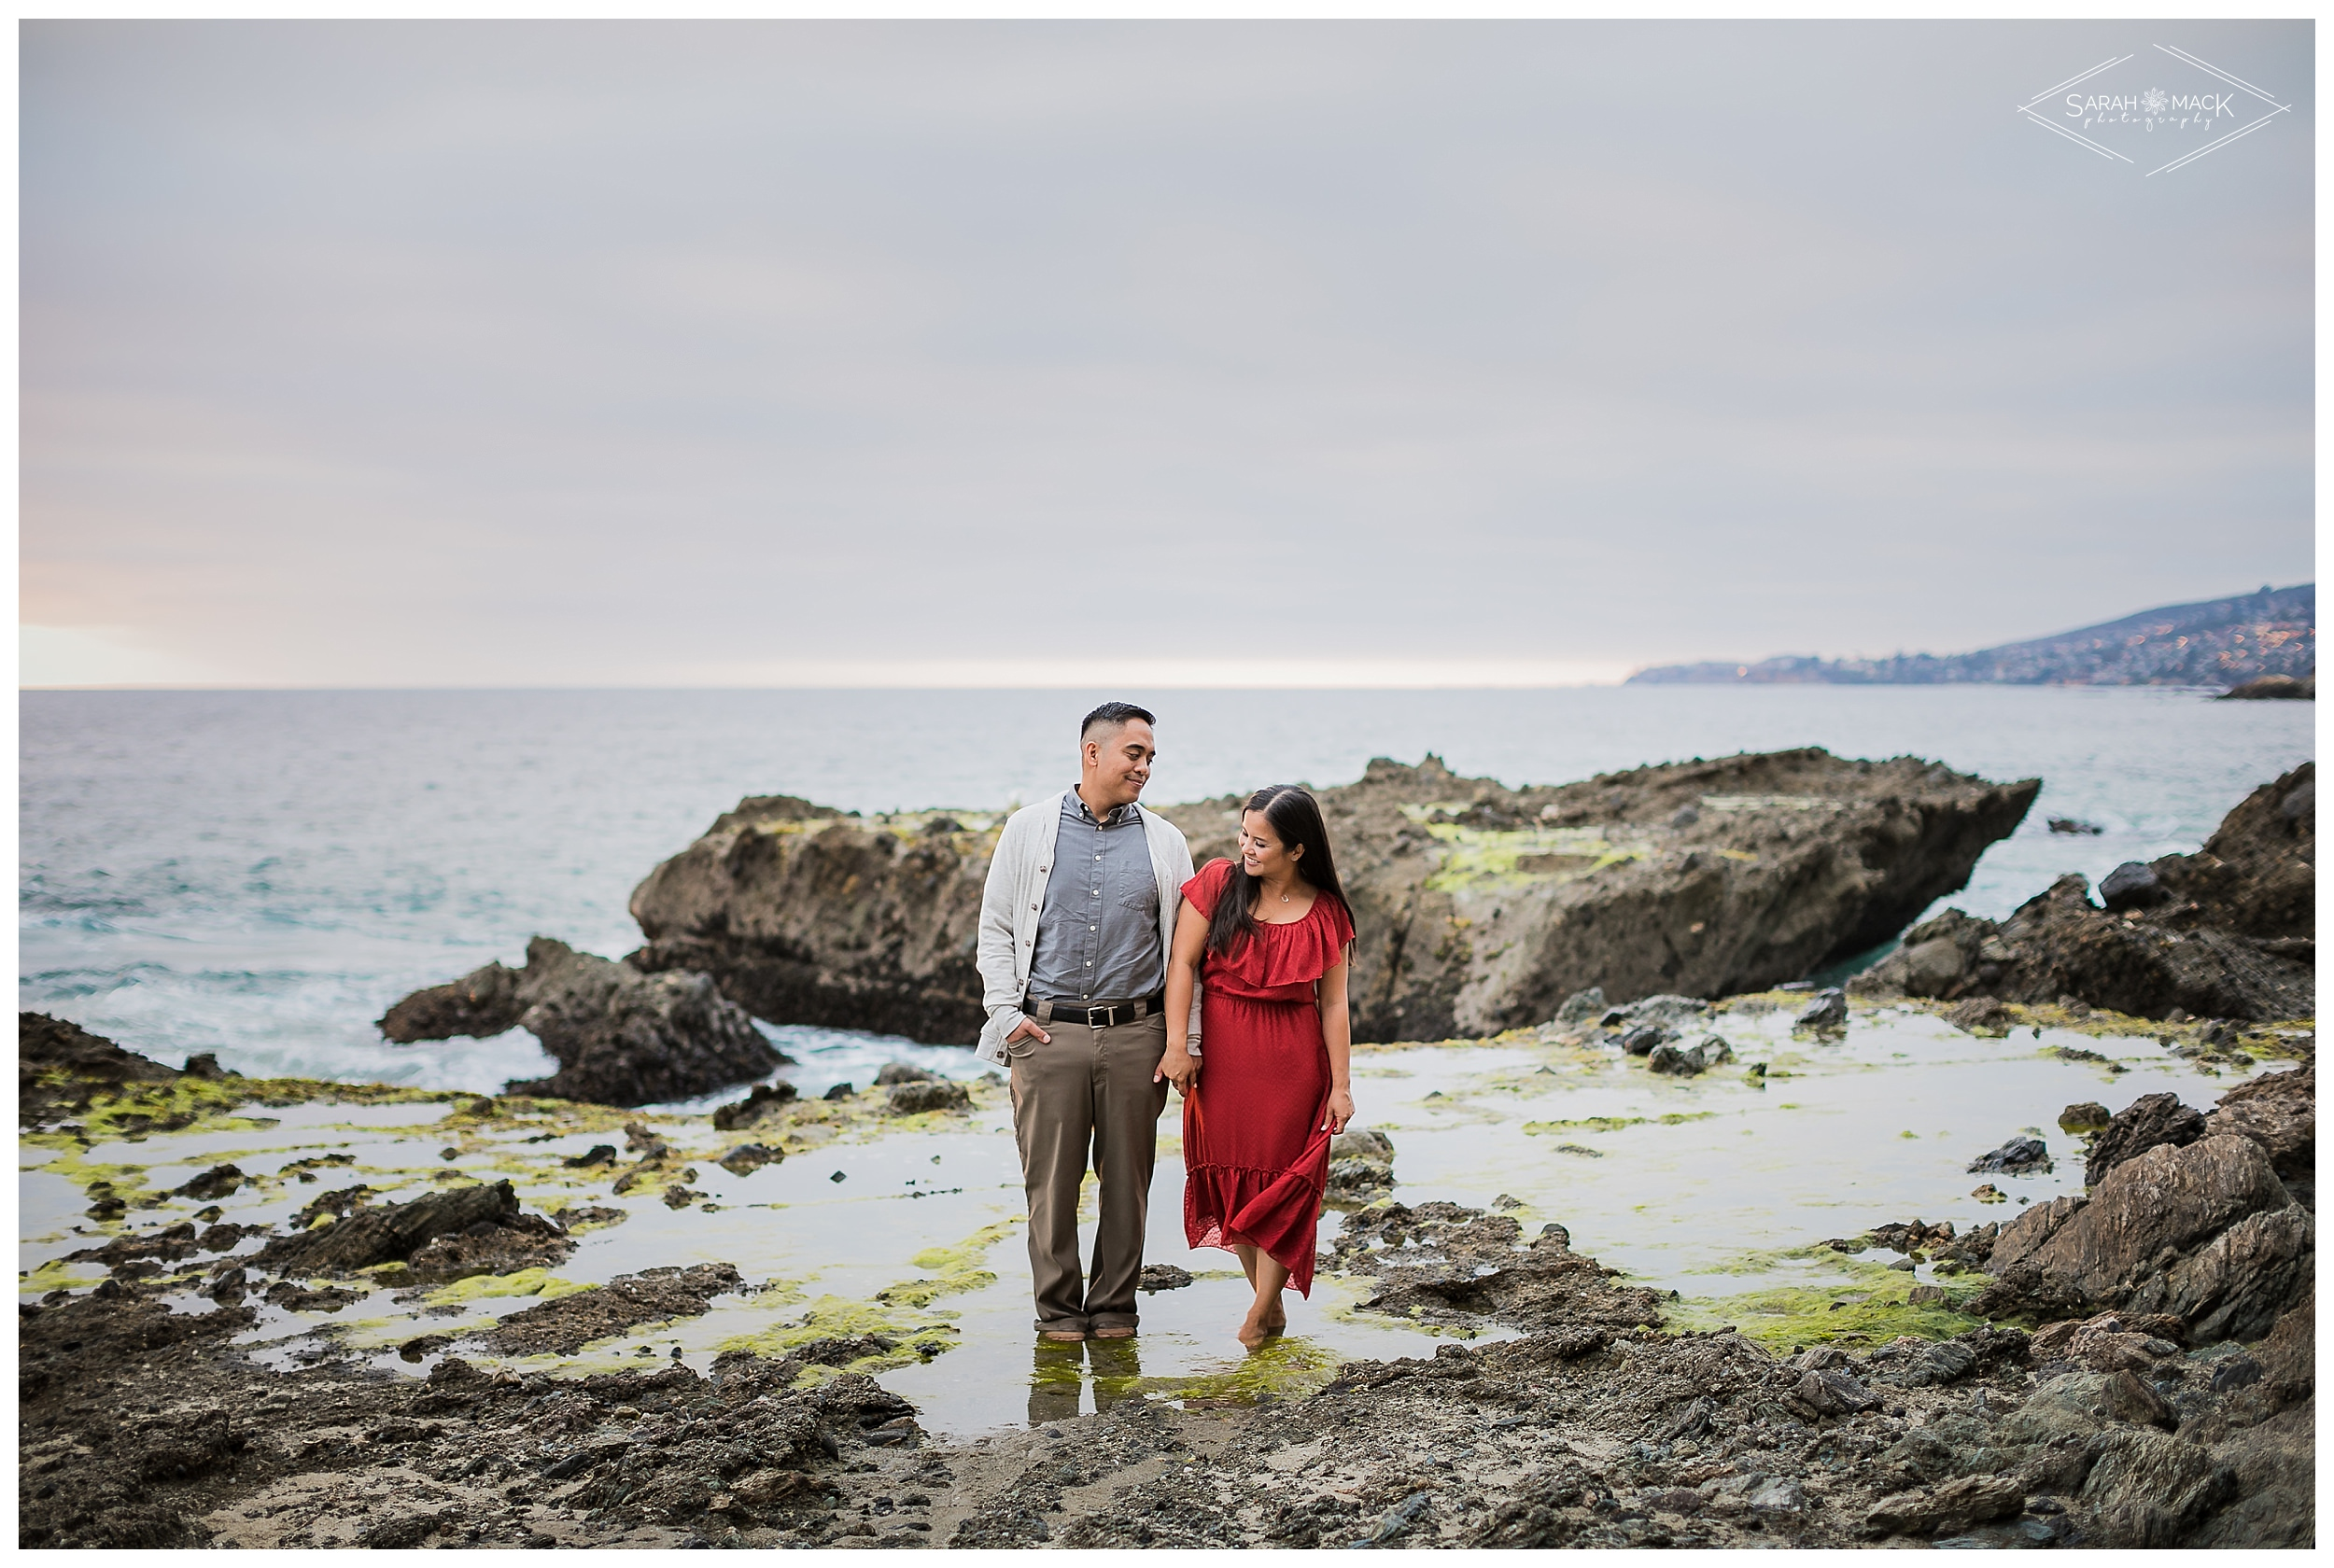 LE_Orange-County-Engagement-Photography 108.jpg